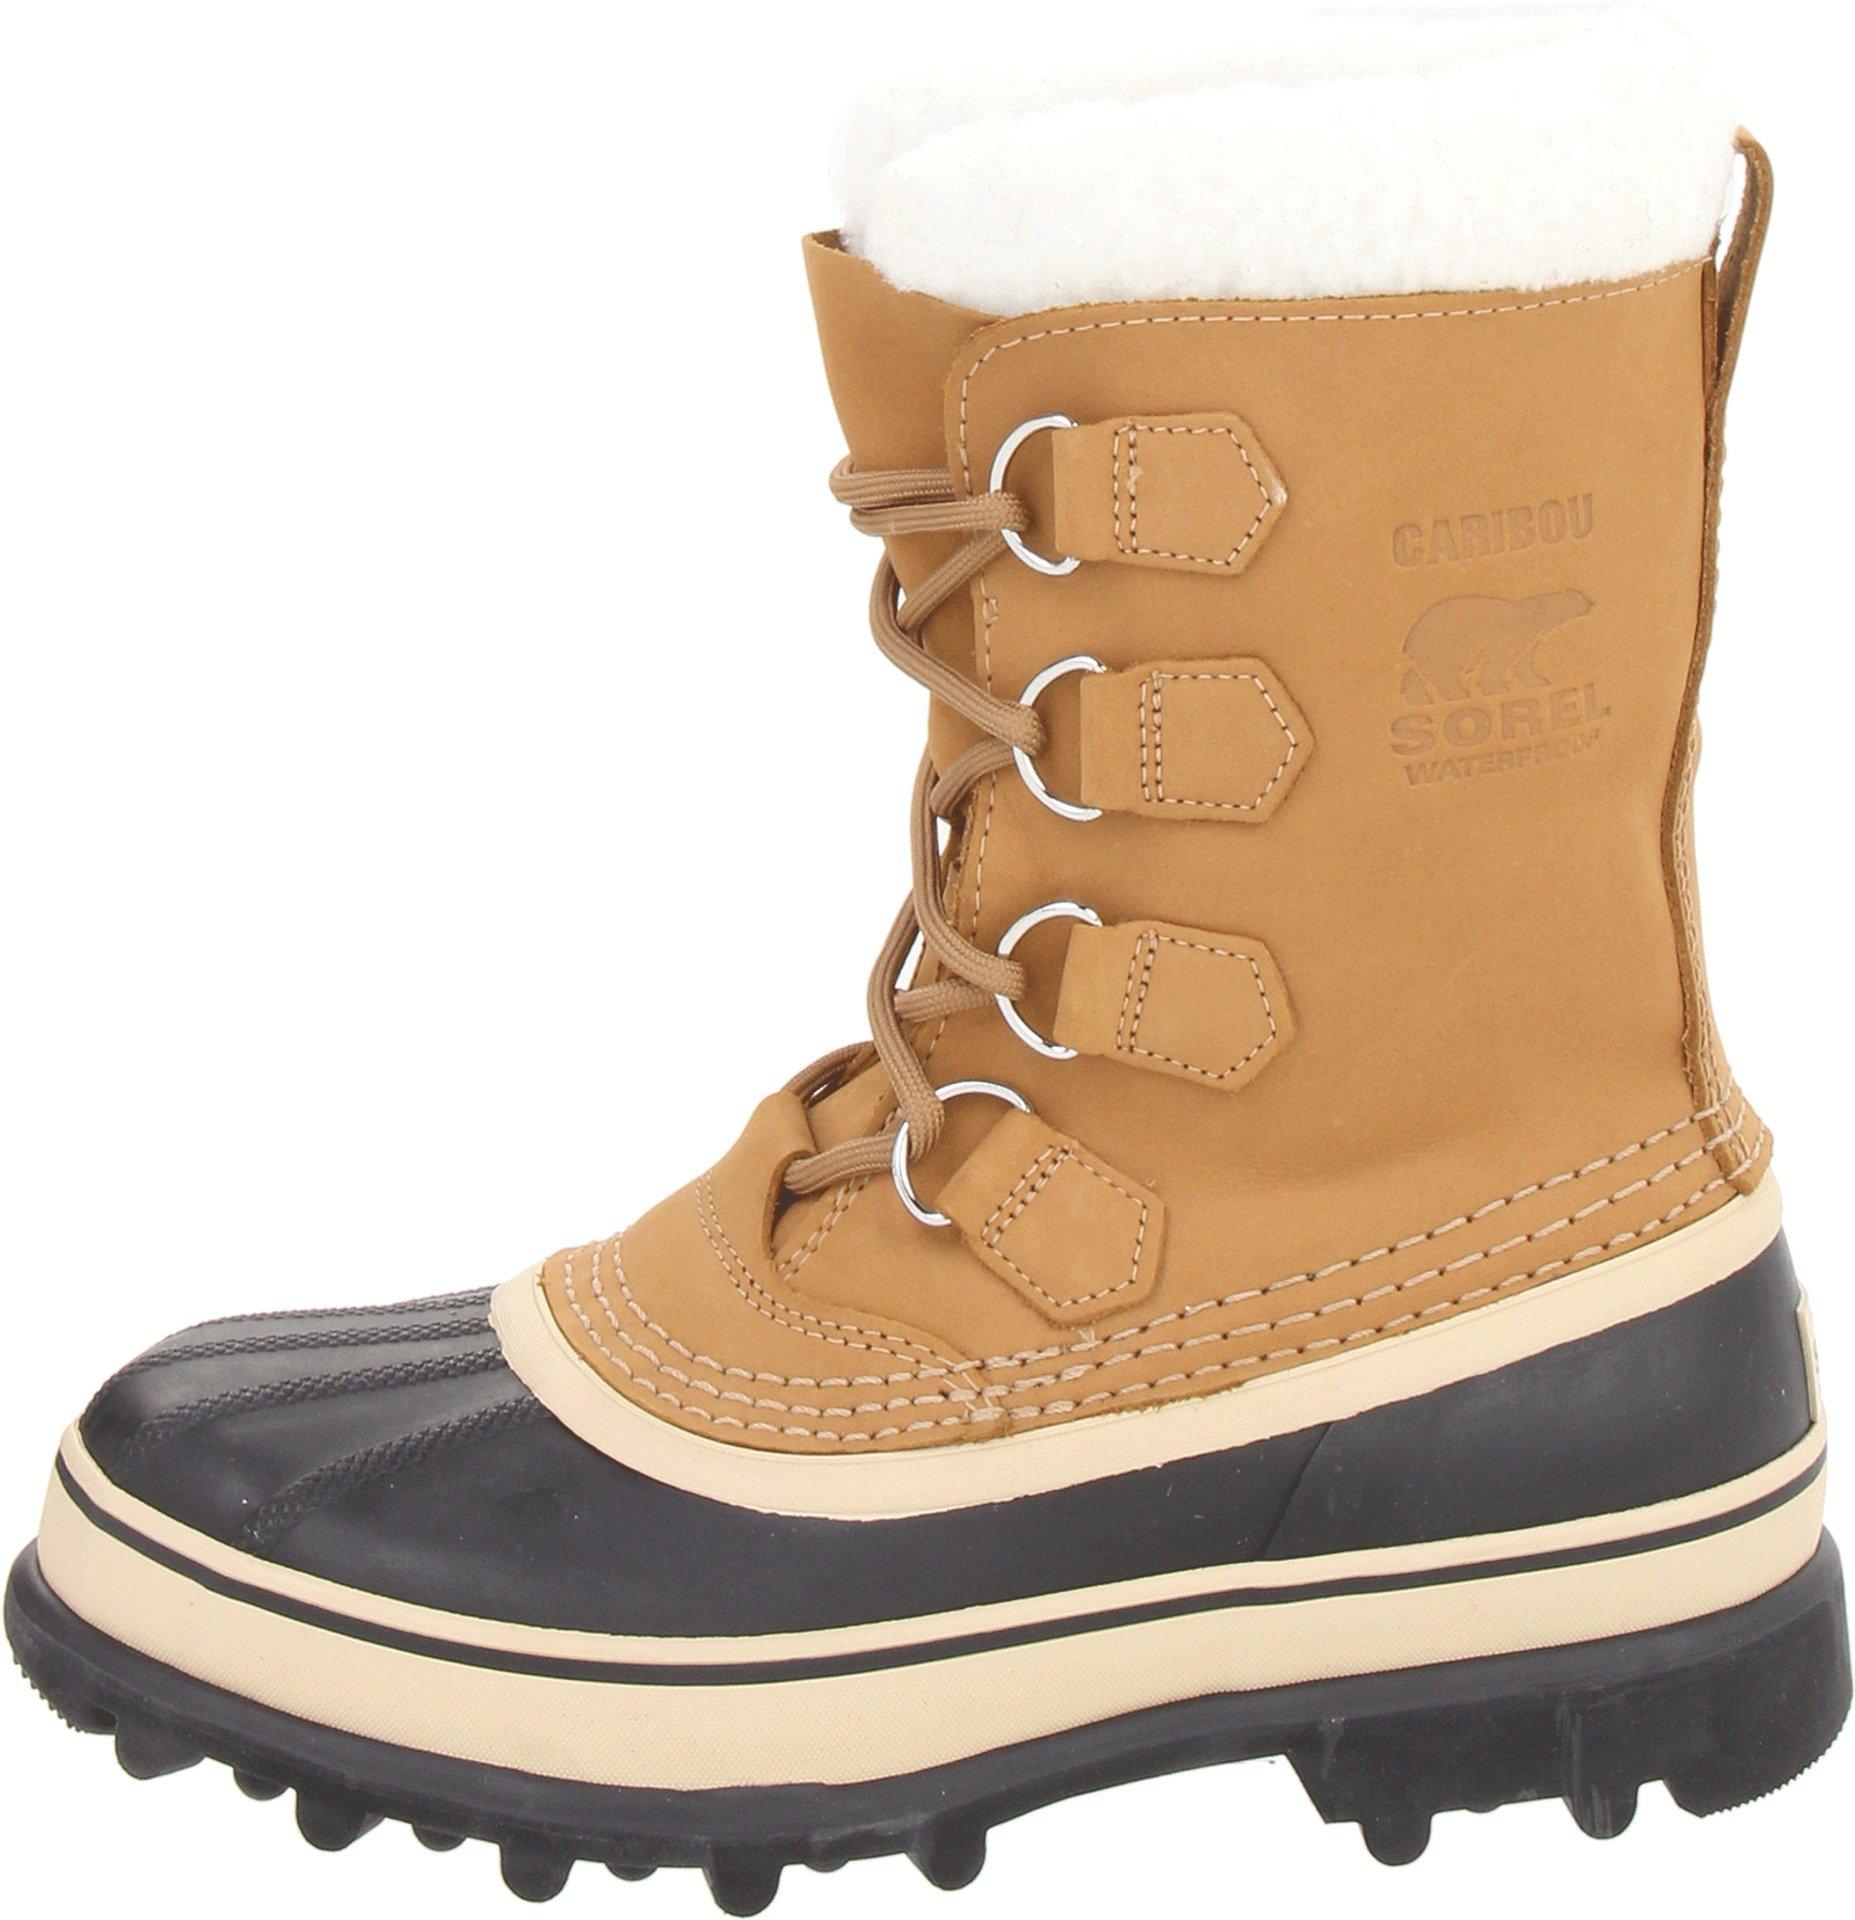 SOREL Women's Caribou NL1005 Boot,Buff,10 M by SOREL (Image #5)